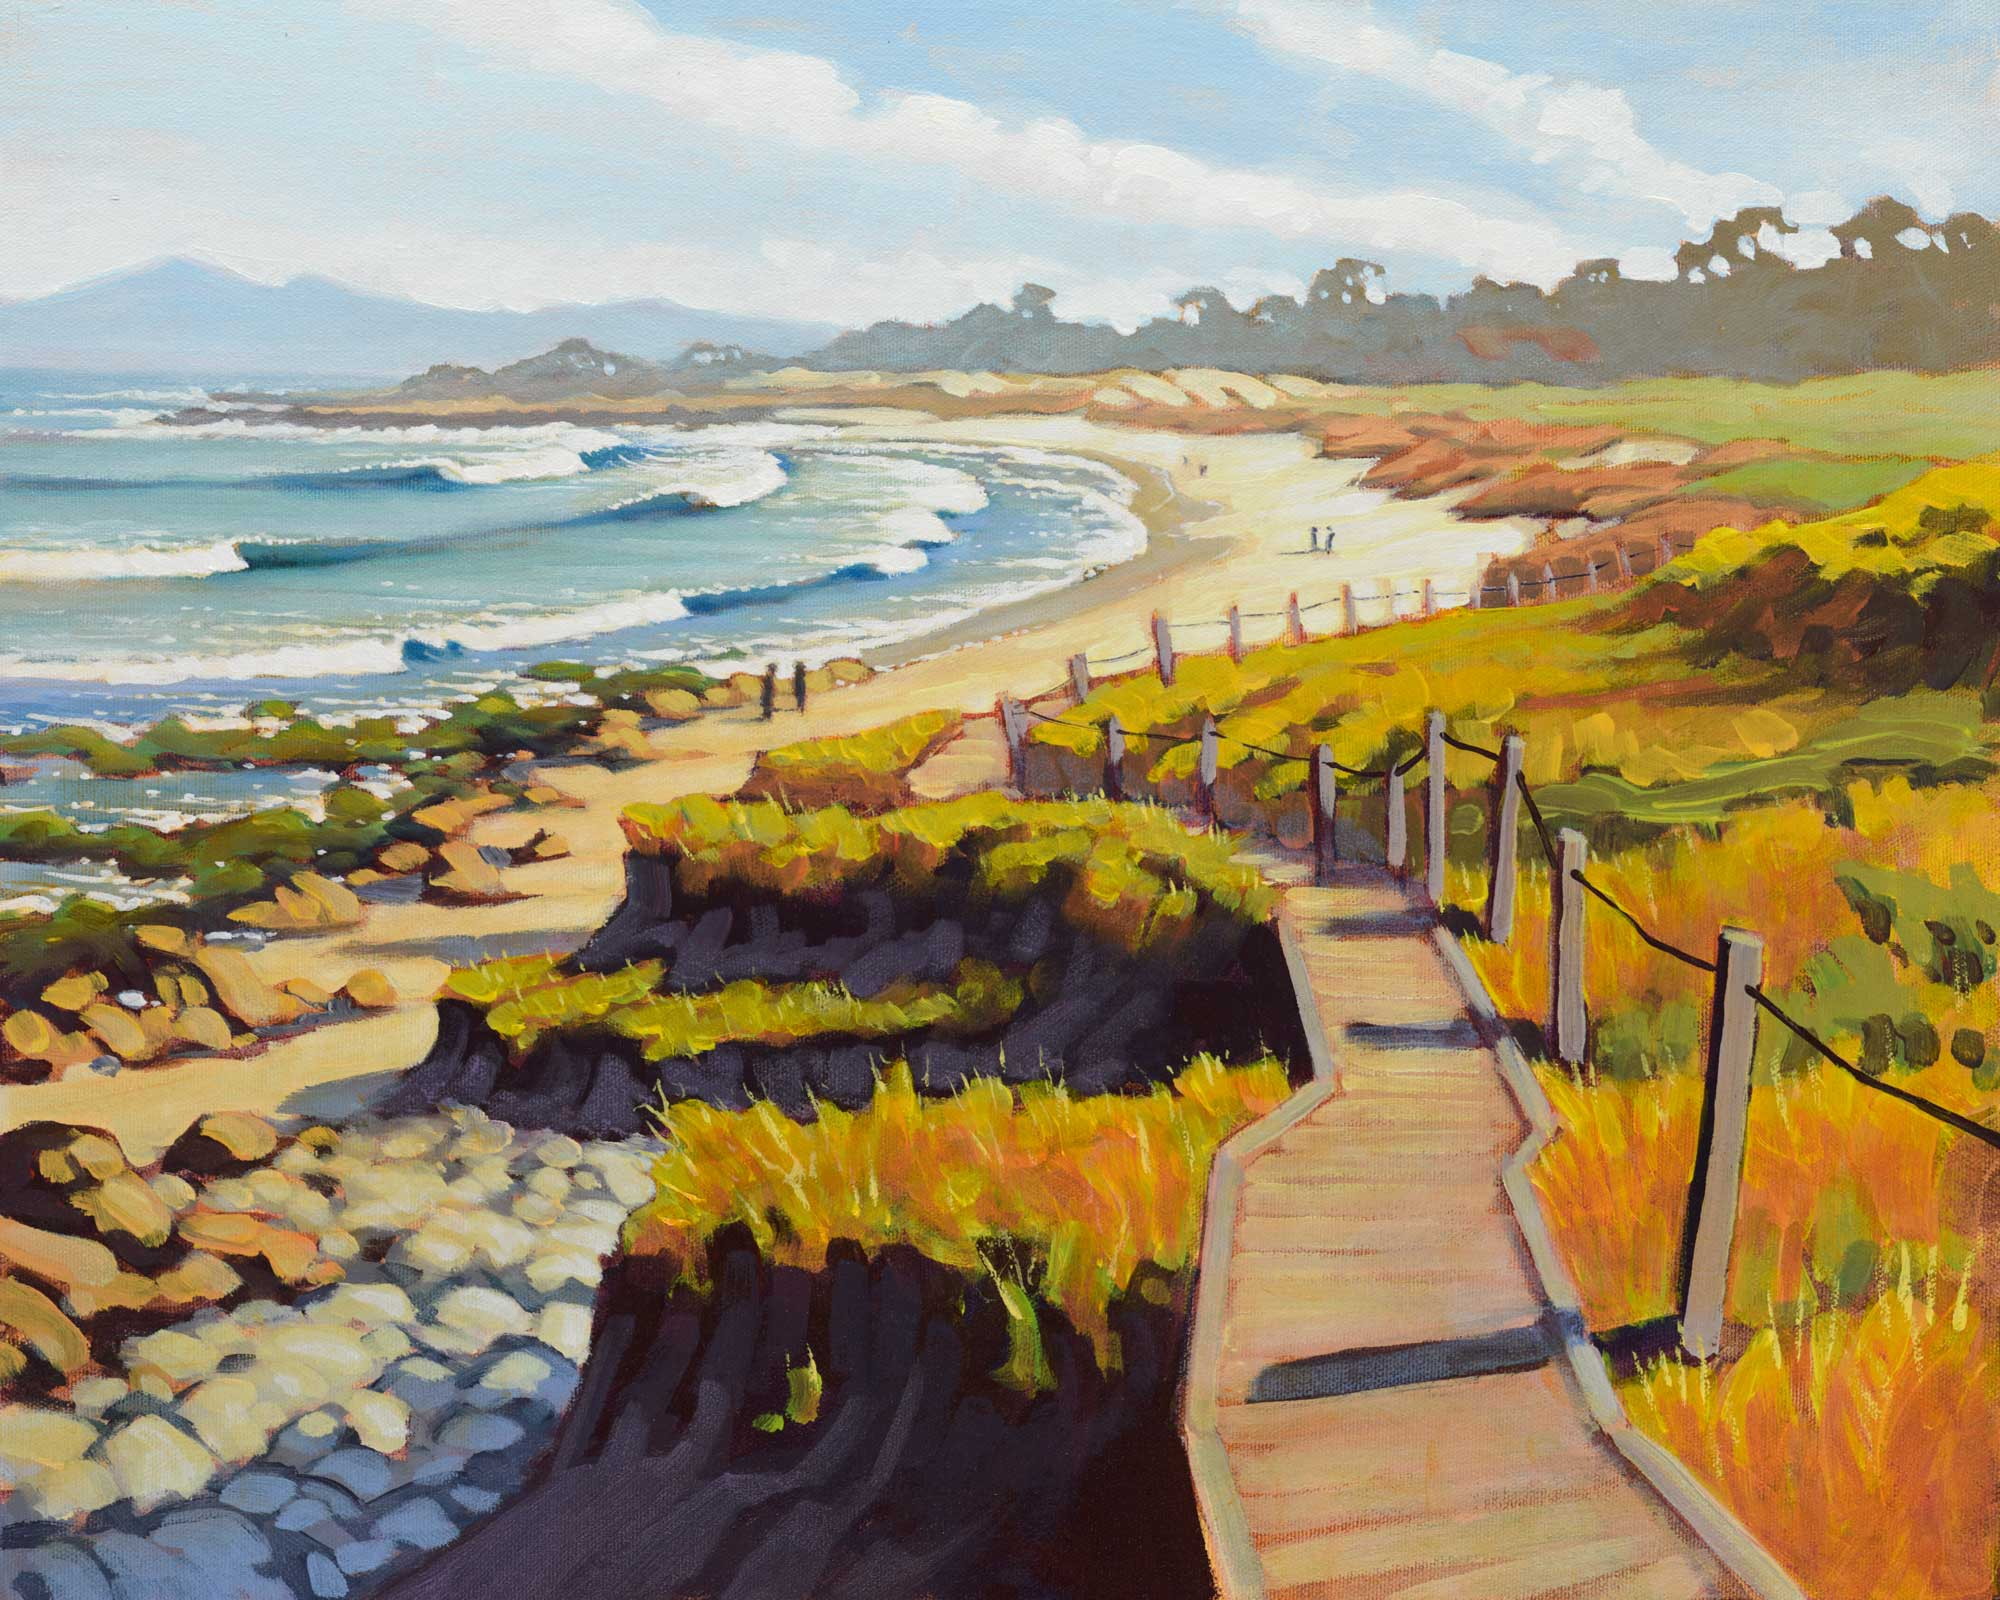 Plein air painting of Asilomar beach from Spanish Bay near Pacific Grove on the Monterey County coast of California